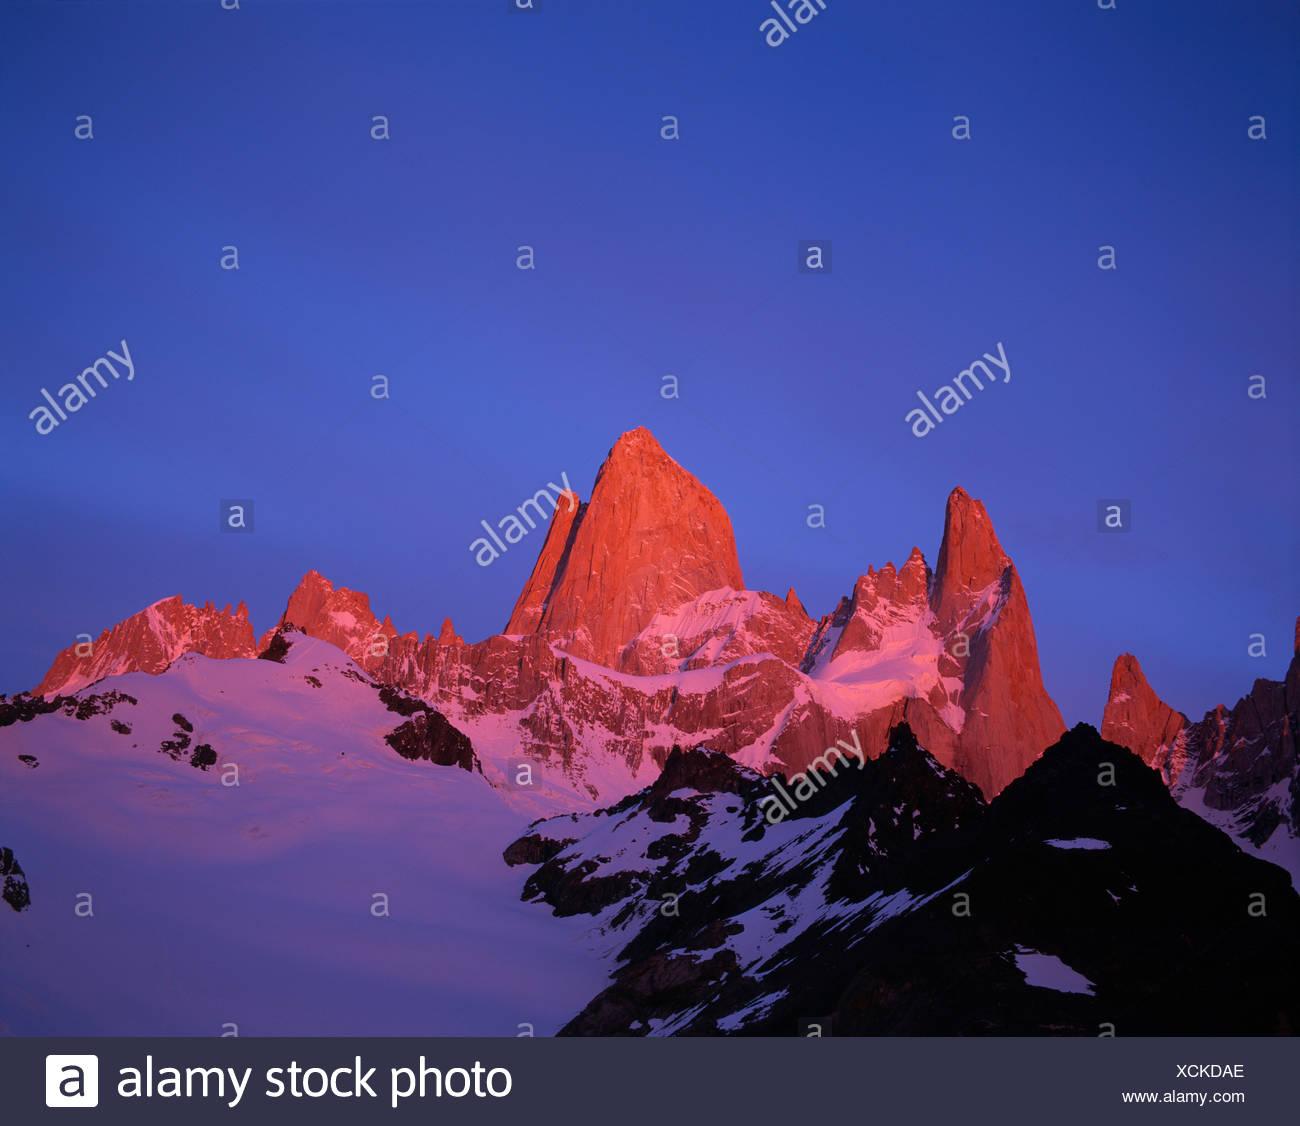 Mt. Cerro Fitz Roy (aka Cerro Chaltén), Patagonia, Santa Cruz Provincia, Argentina, Sud America Immagini Stock